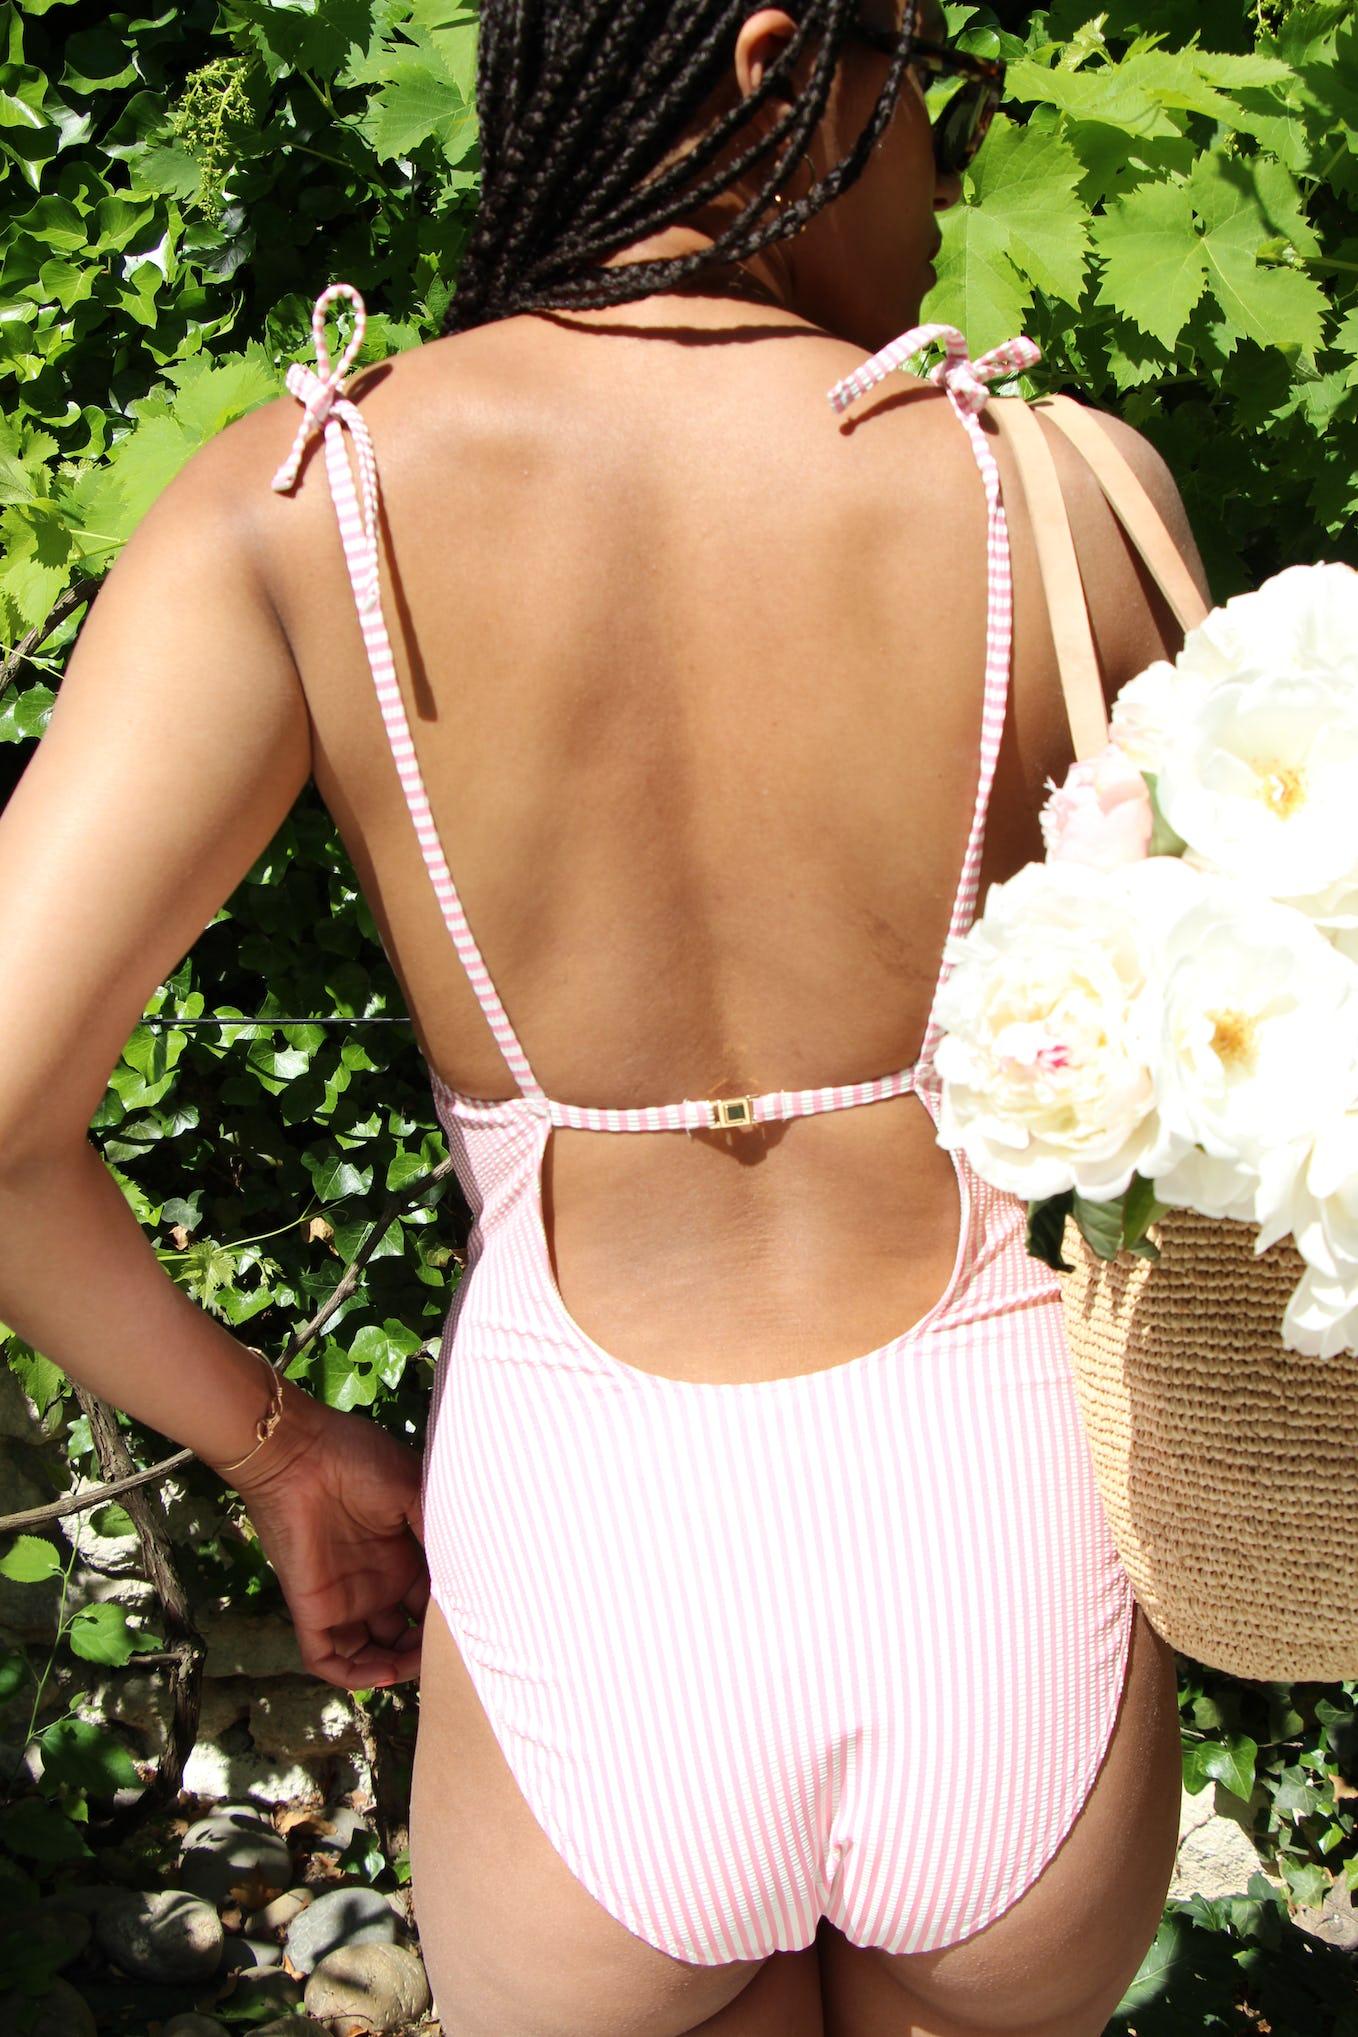 Léna is wearing the swimsuit Soleil sur l'eau in pink